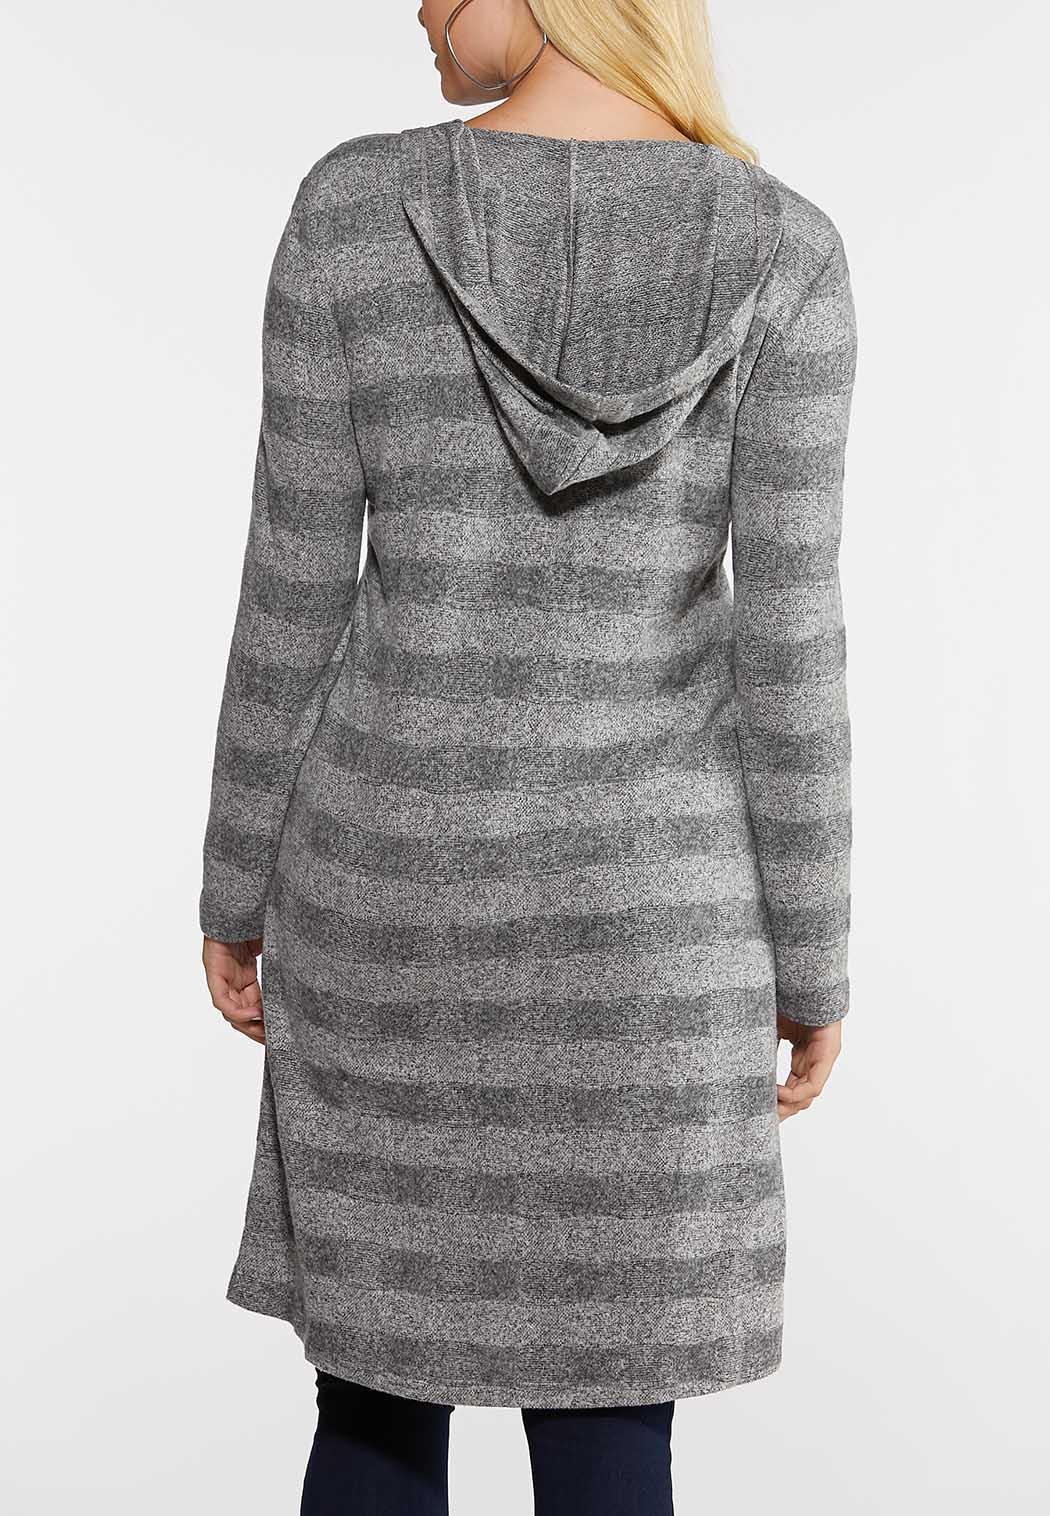 Gray Stripe Cardigan Sweater (Item #44028119)